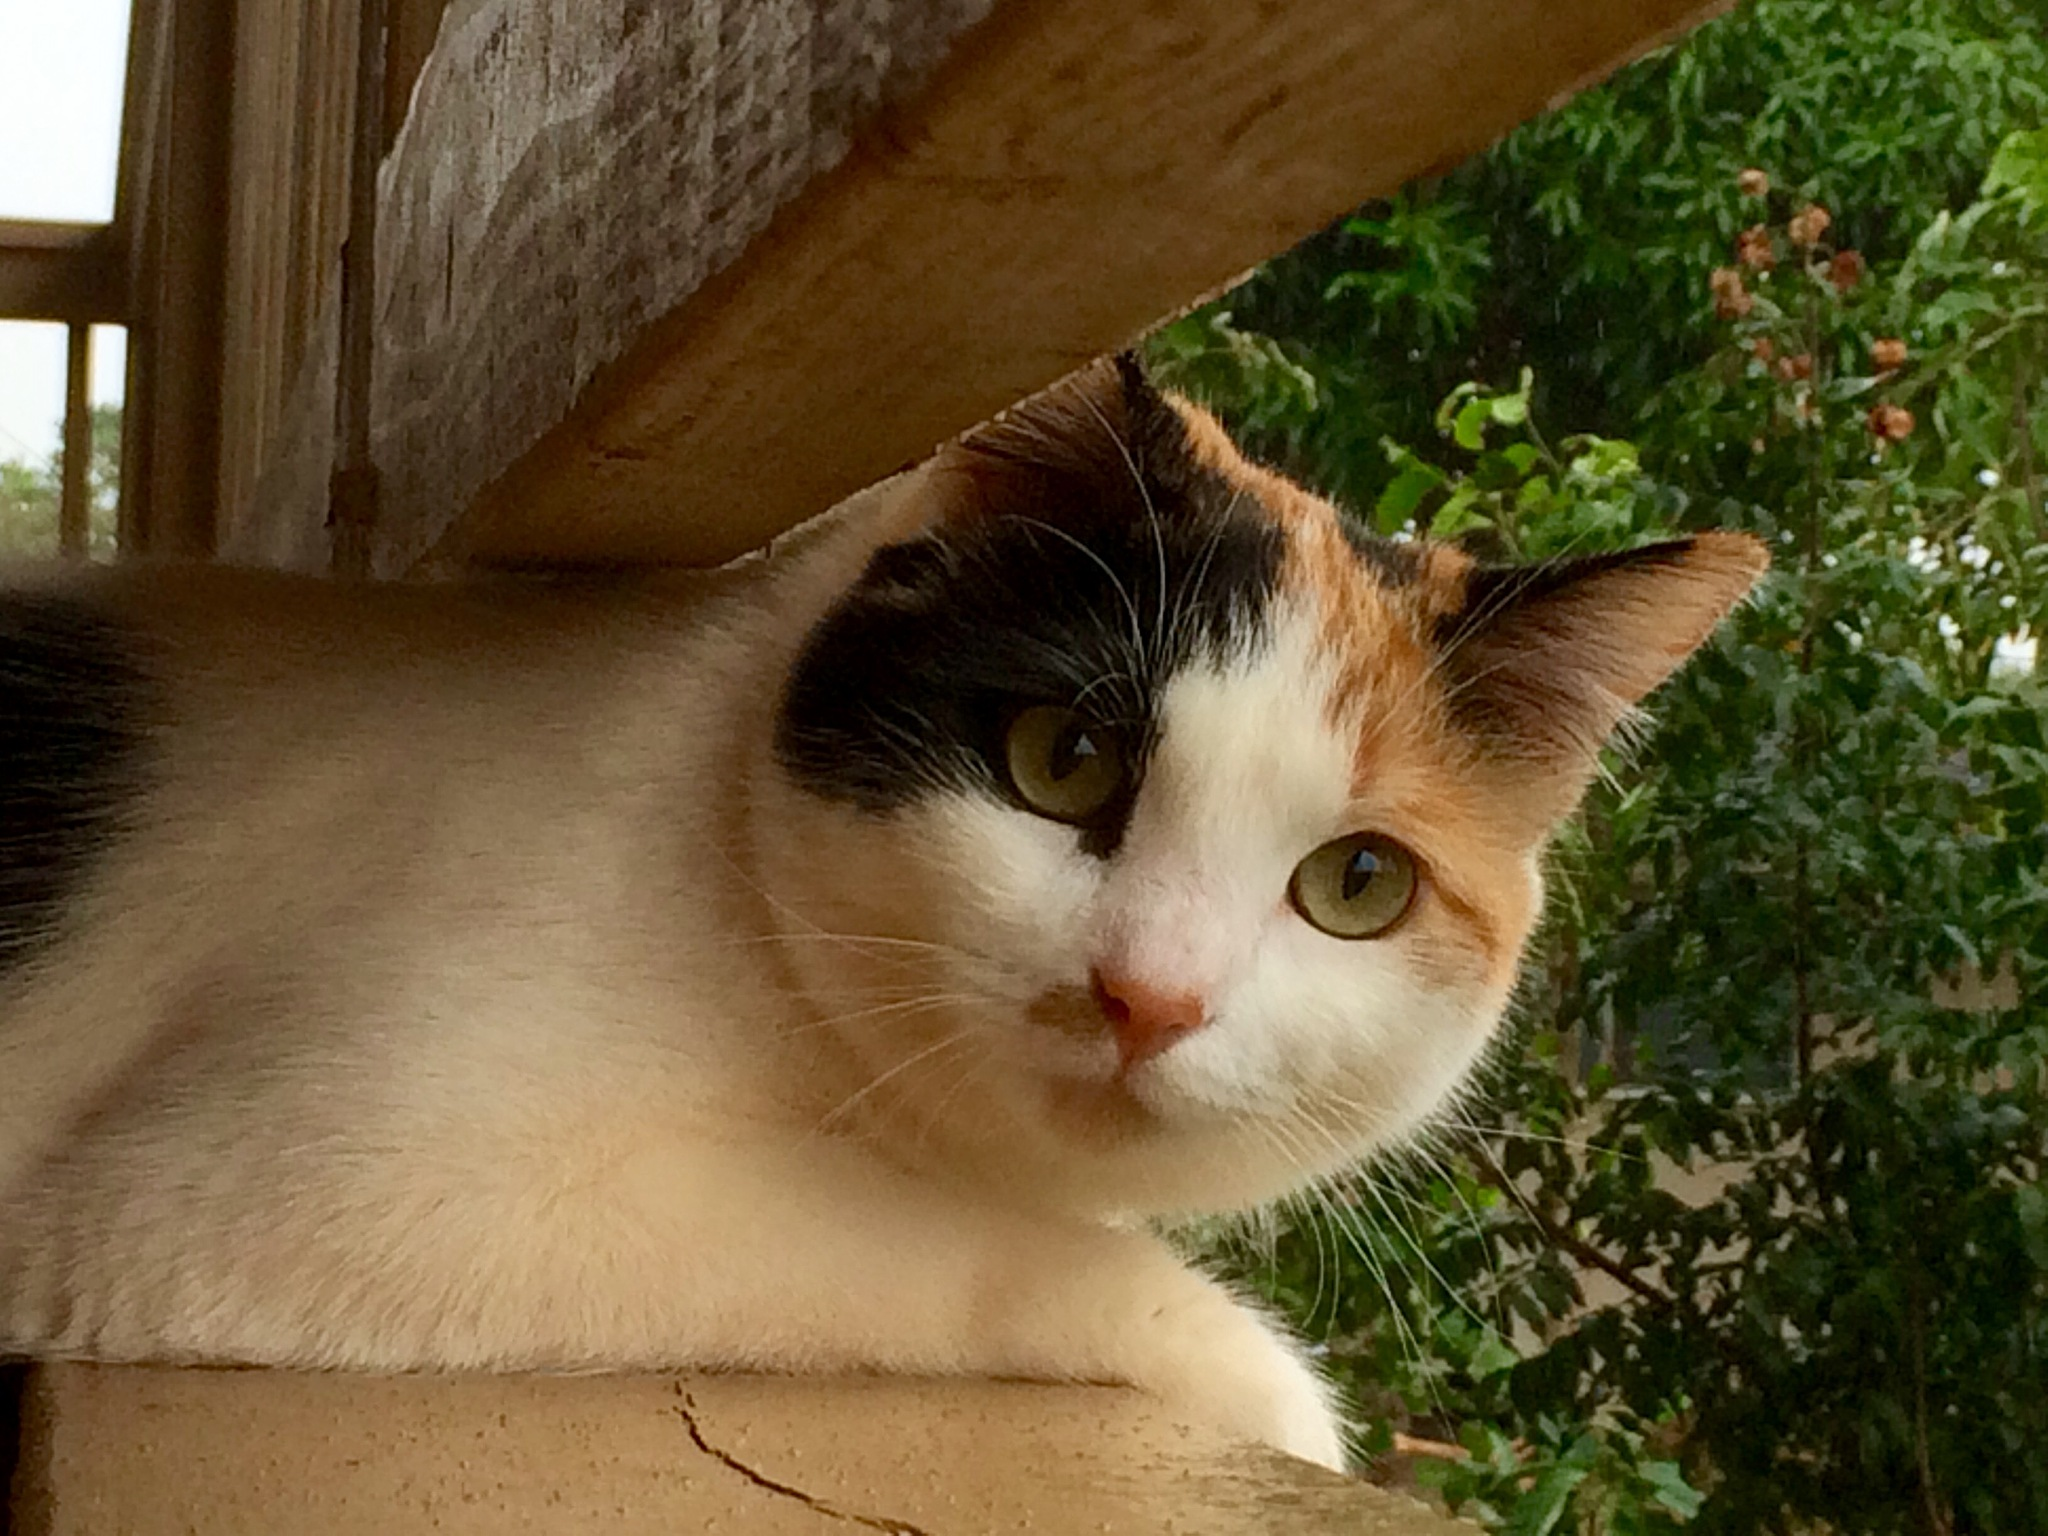 Cat Scan by gstyer